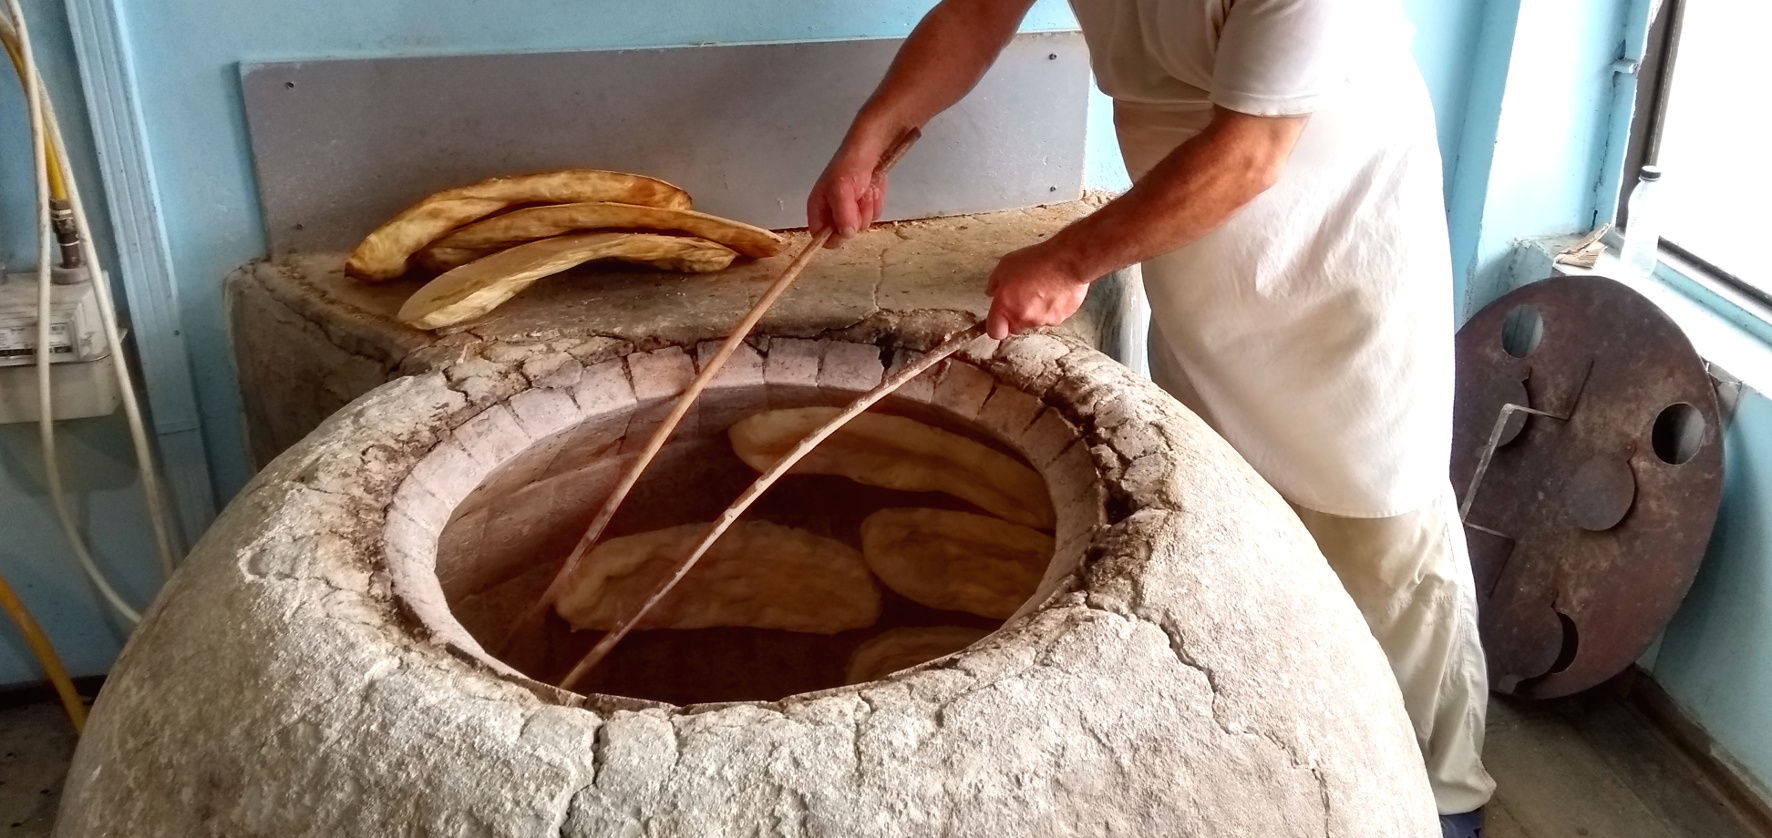 Georgische Backstube Bäcker Brot